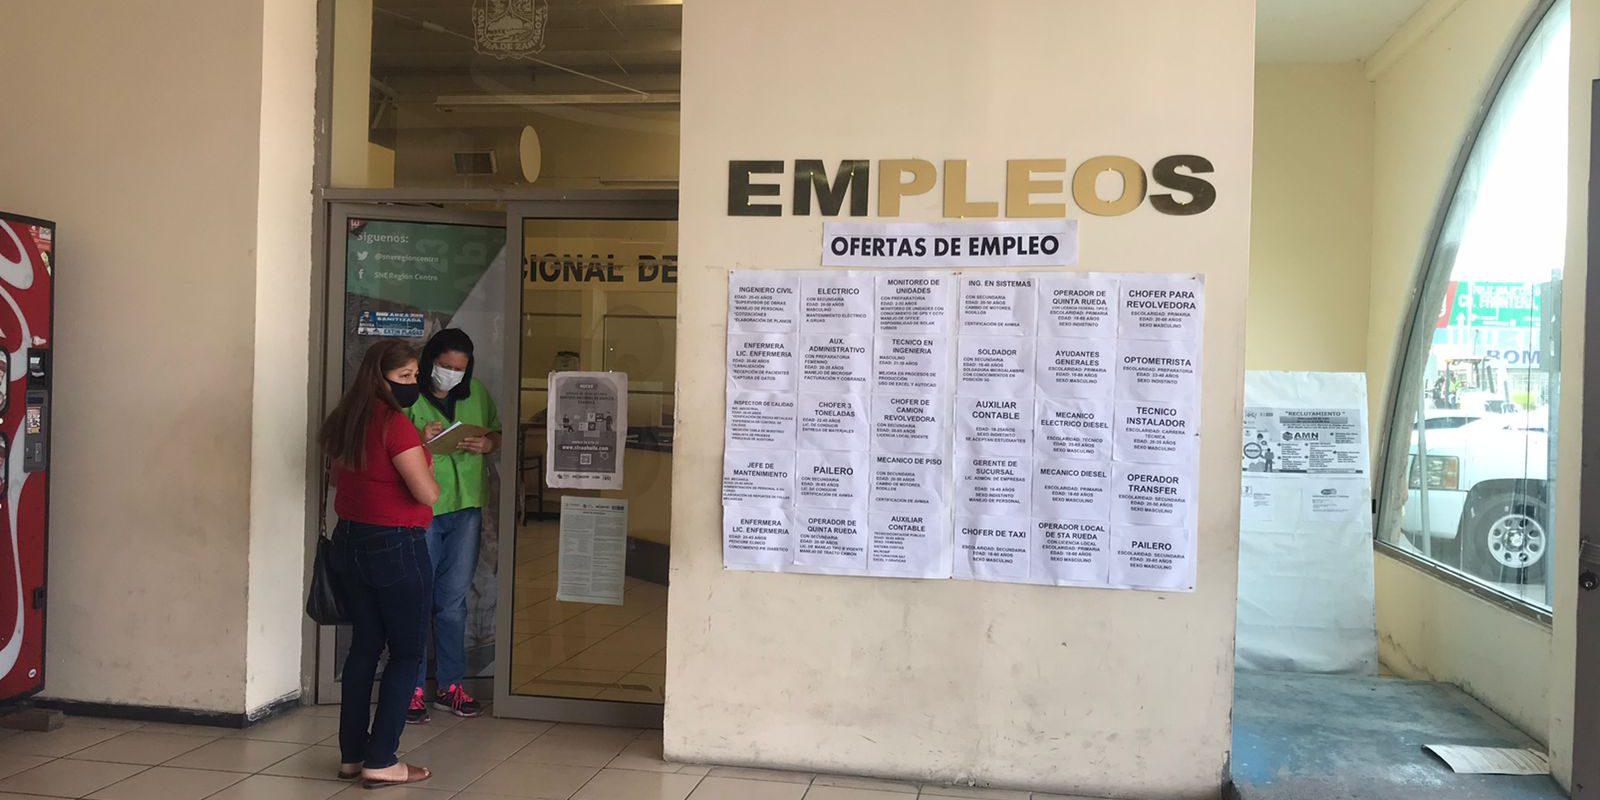 ¡Trabajo si hay!…oferta oficina regional del empleo 25 vacantes en Monclova